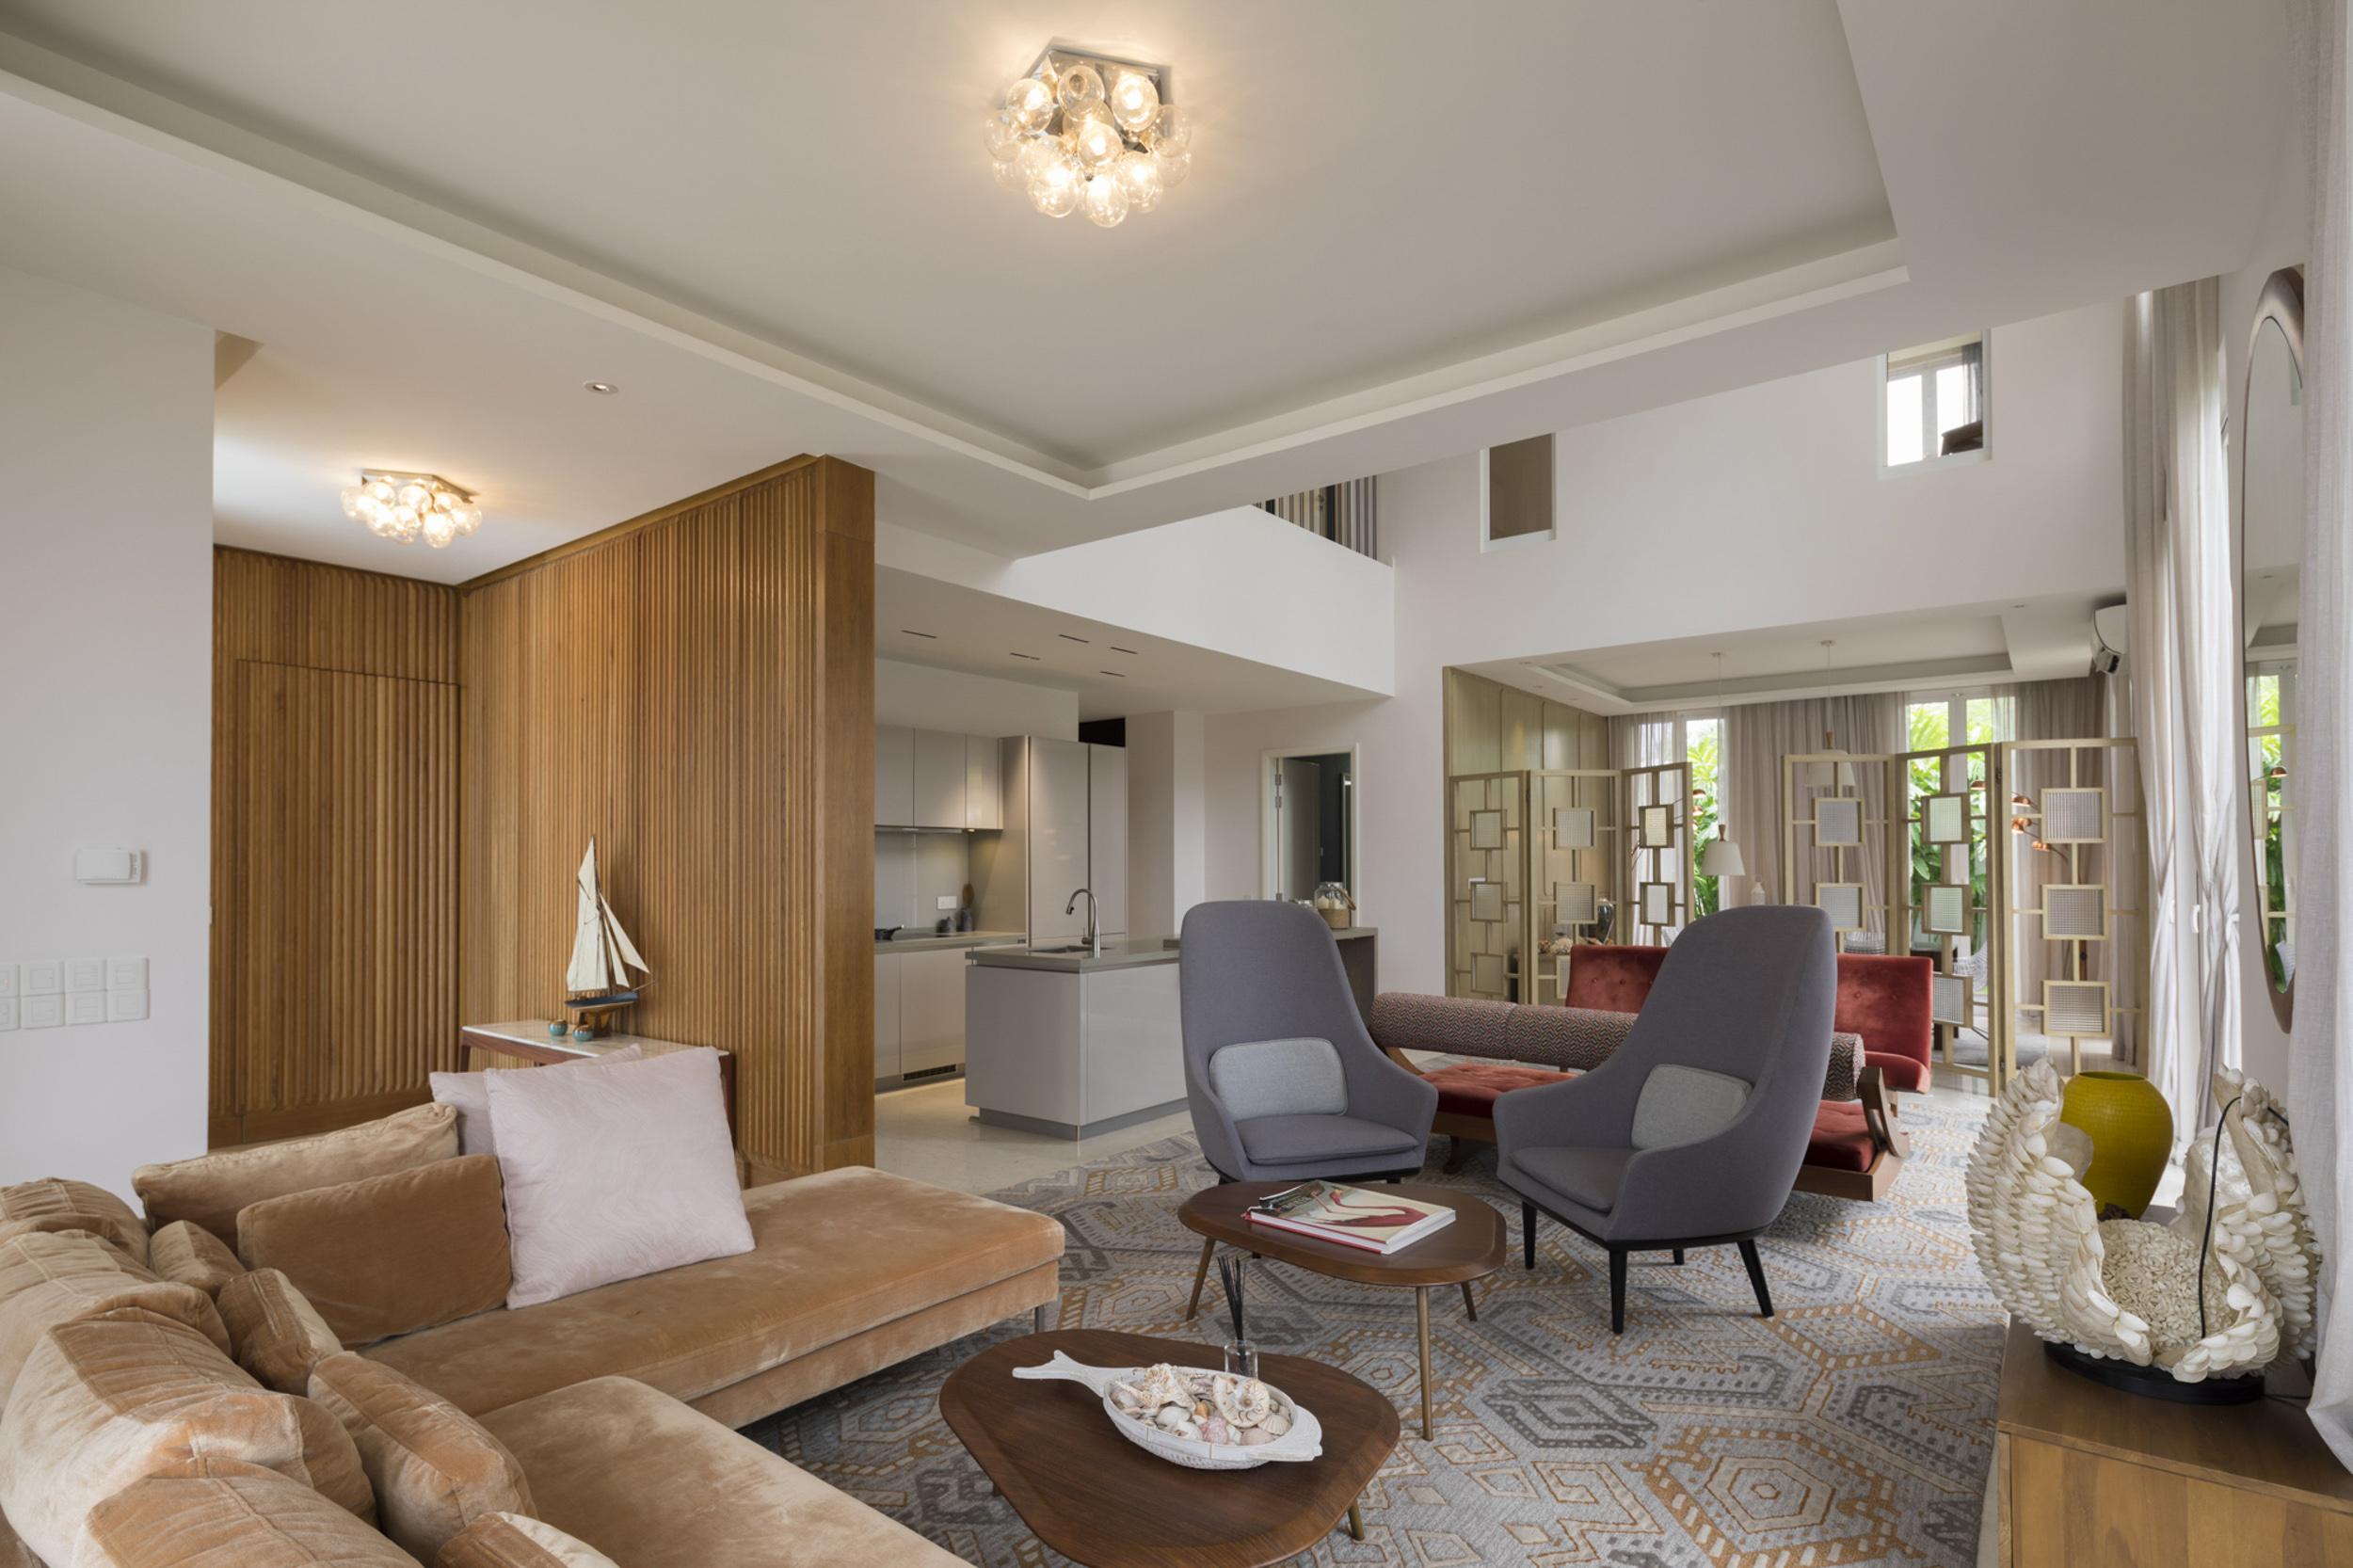 residential_architect_photographer_sydney_02.jpg